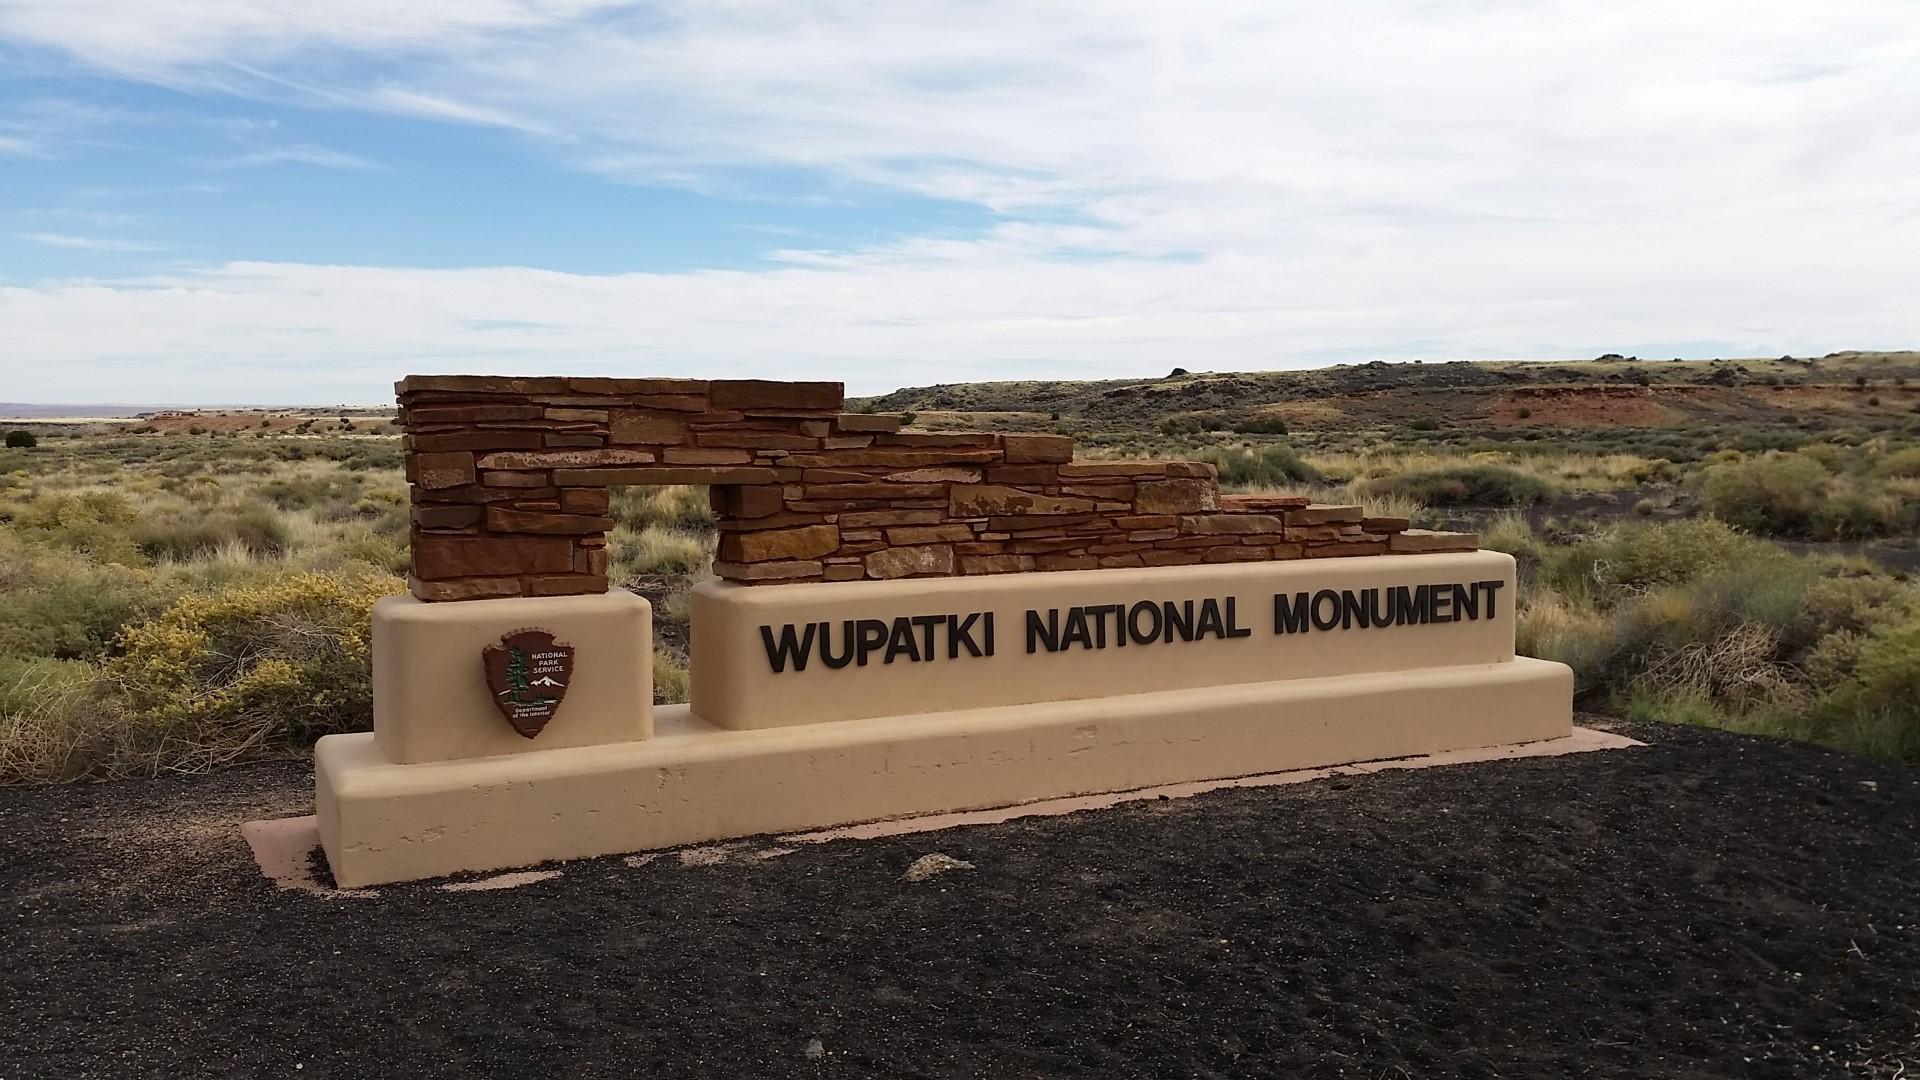 USA Tag 20: Sunset Crater, Wupatki National Monument, Flagstaff, Phoenix (2014-10-15)